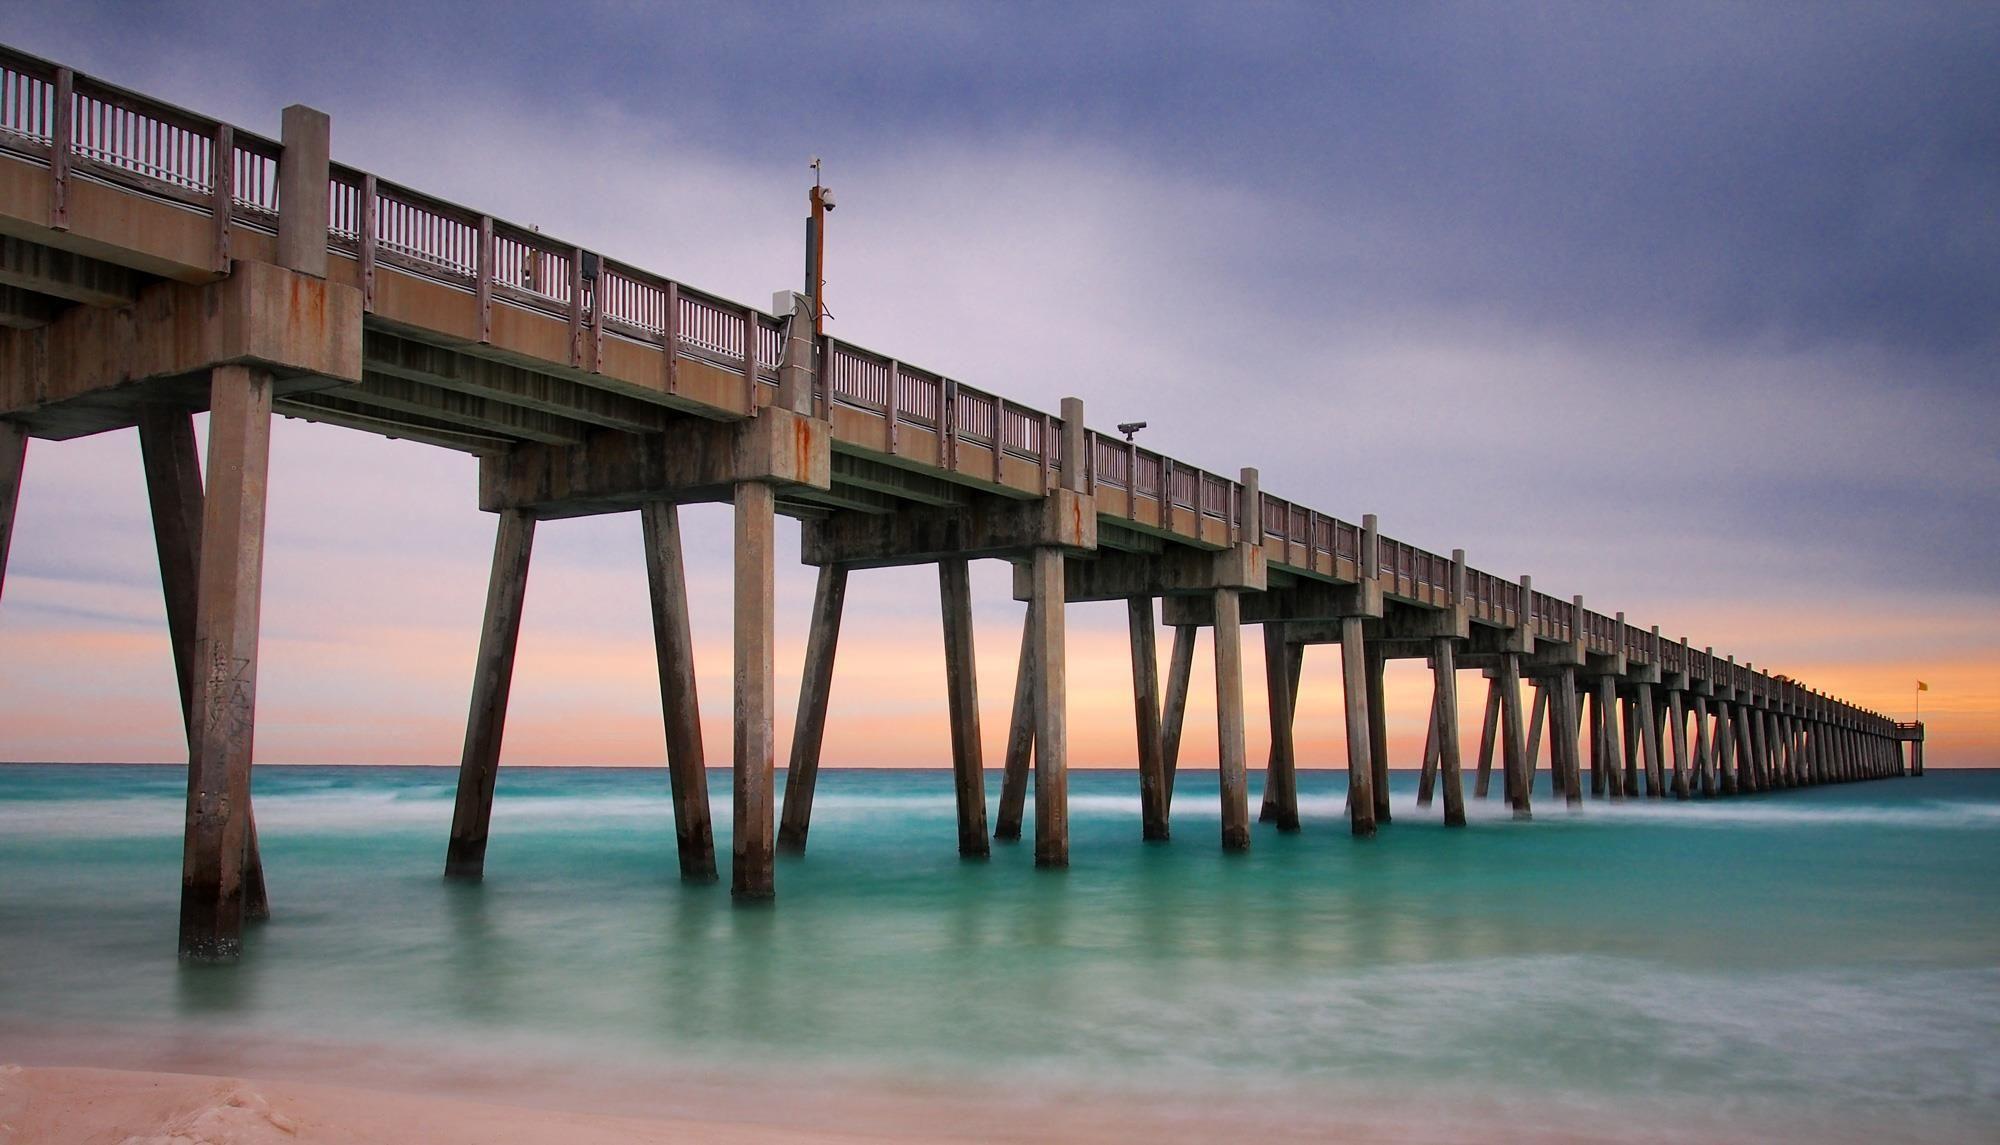 Pensacola pier beach pensacola beach perdido key for Navarre fishing pier